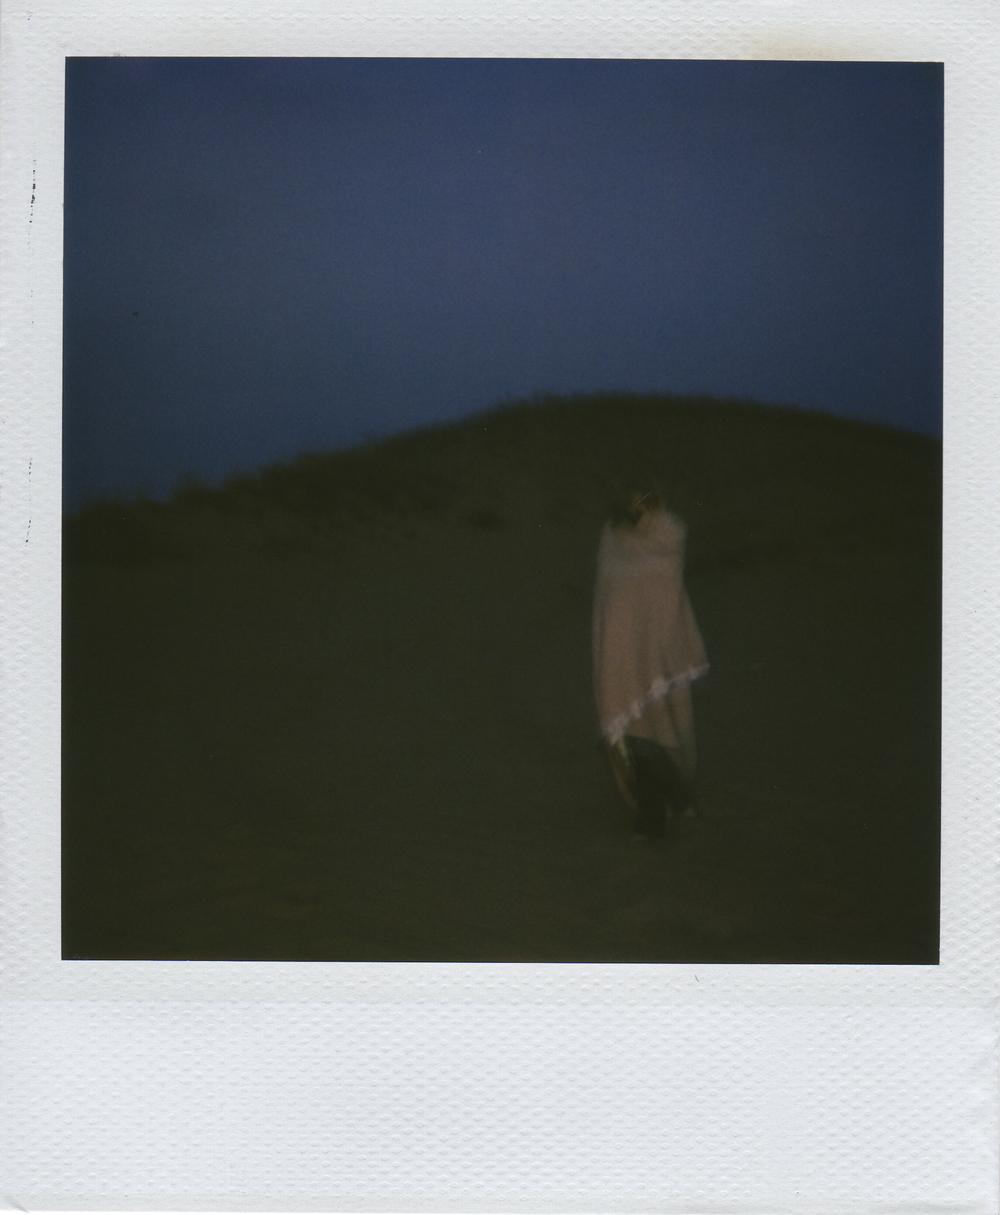 jlaurence-polaroid-021.jpg